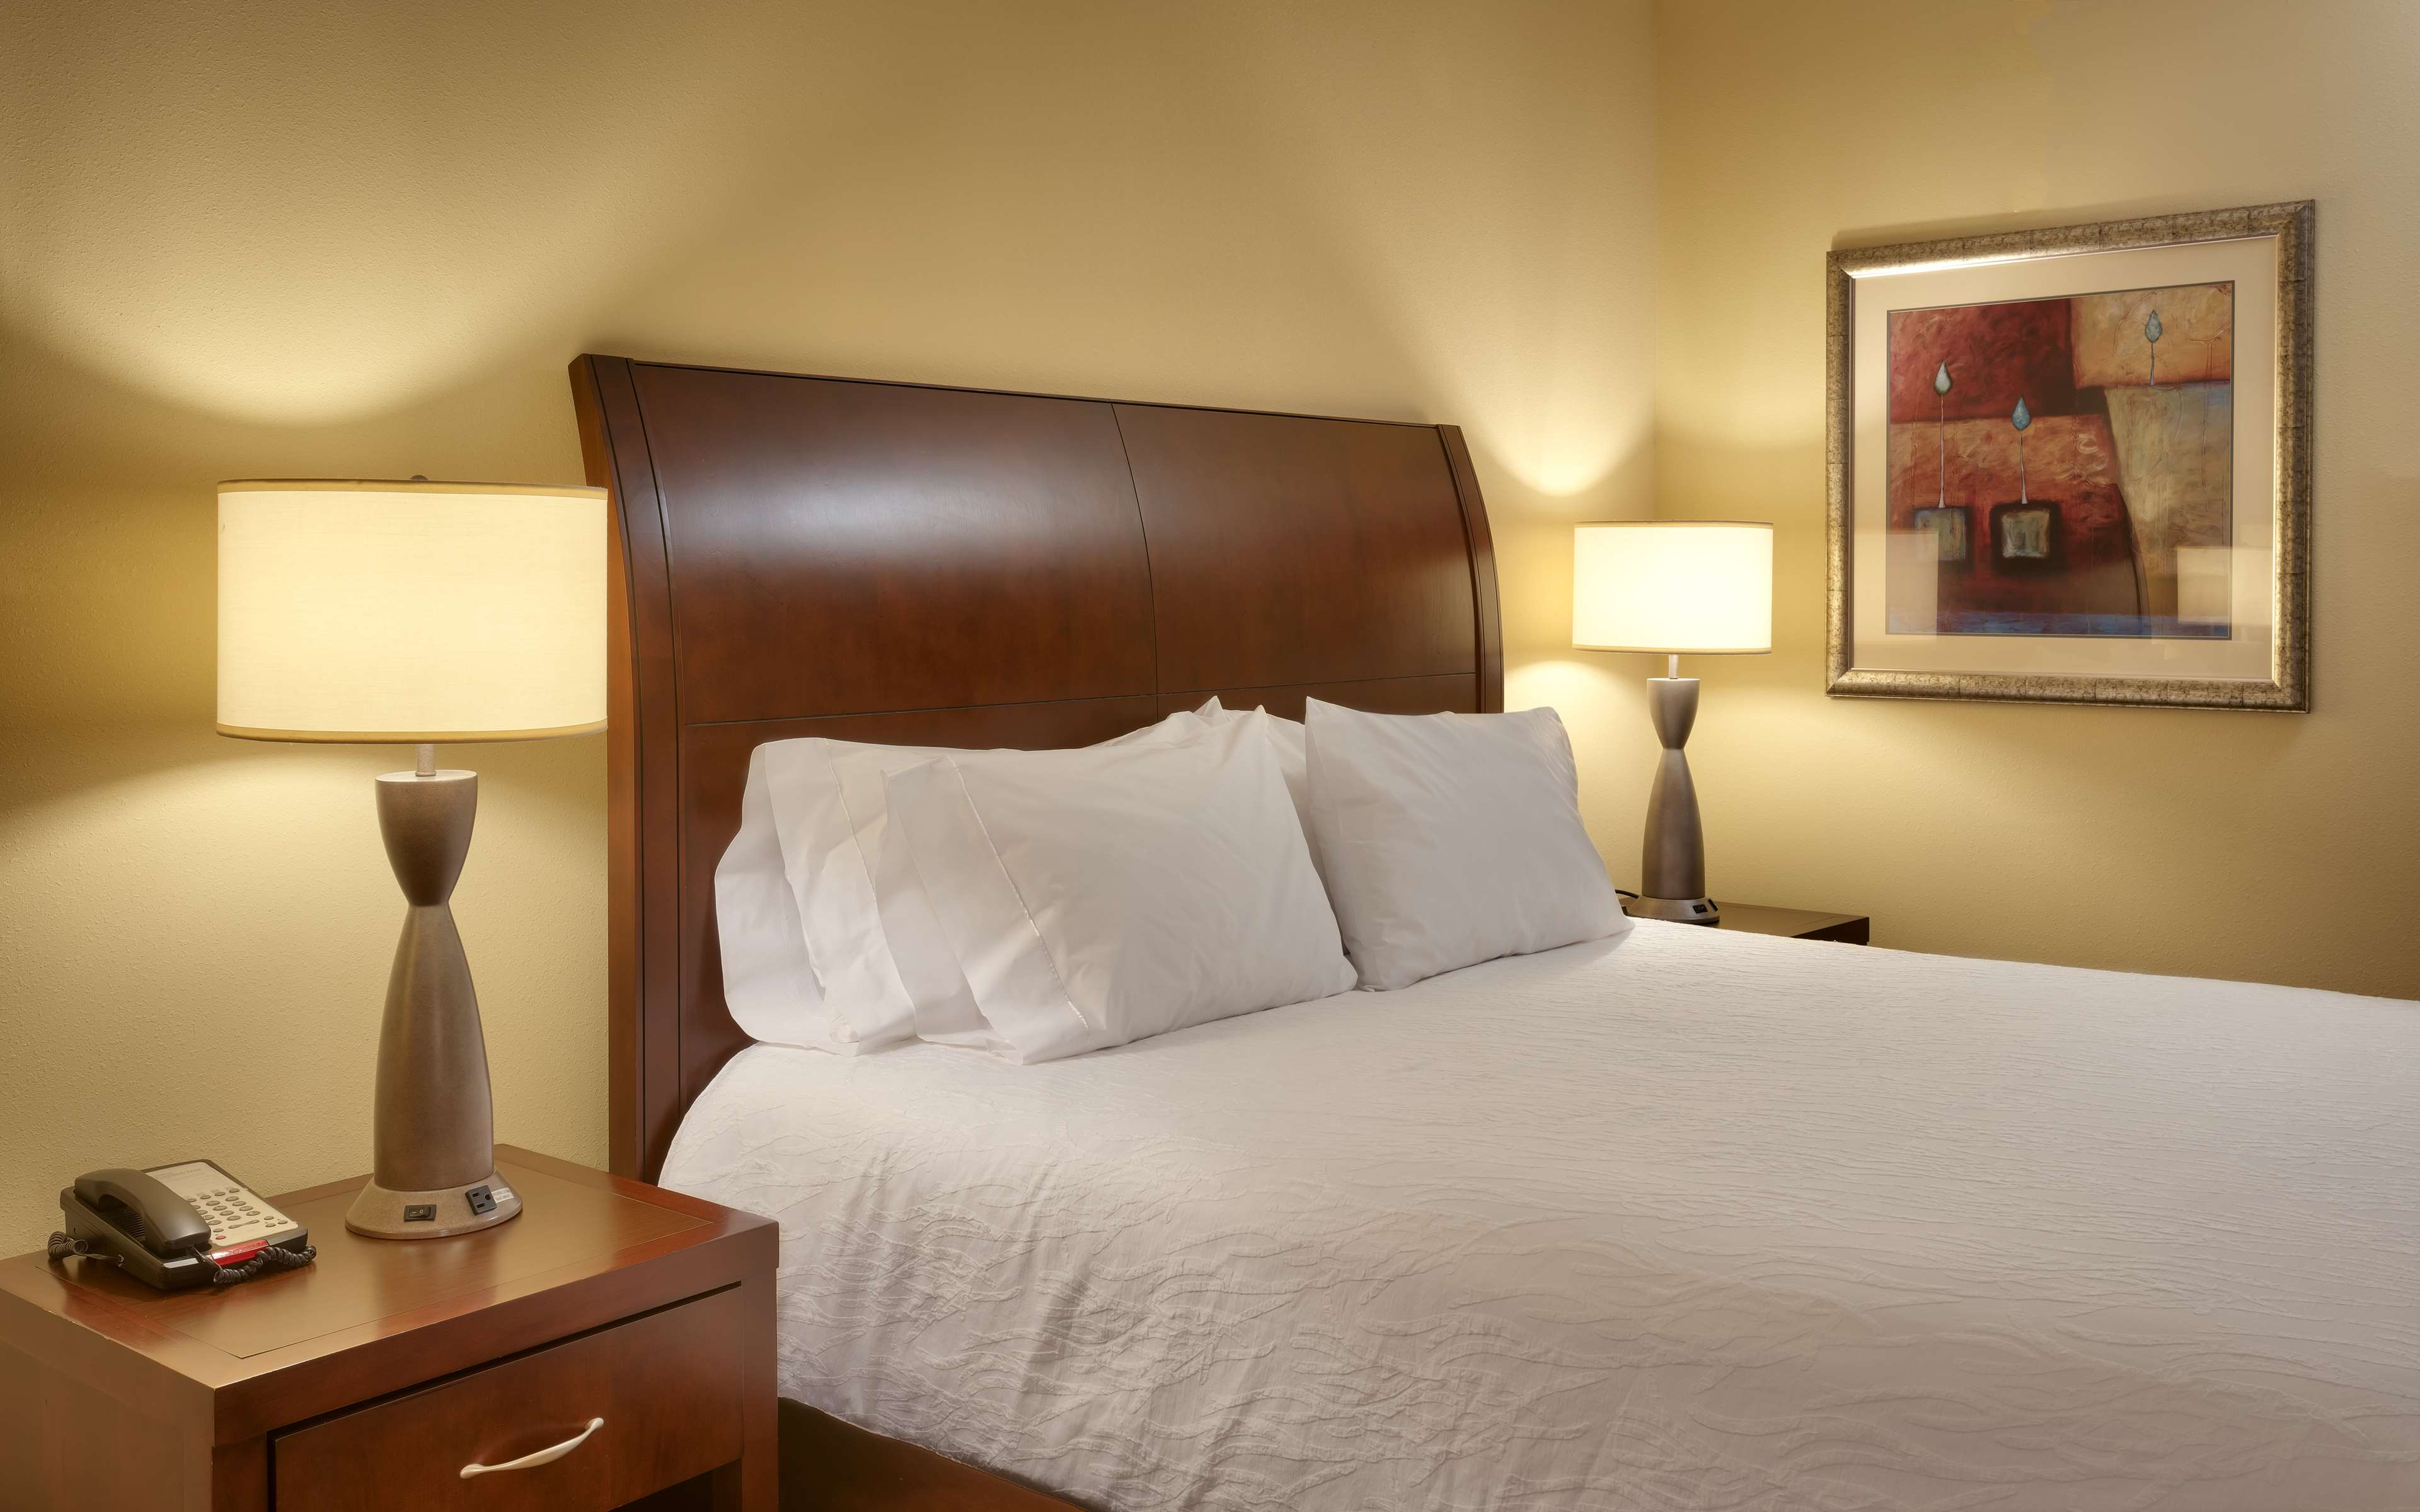 Hilton Garden Inn Clarksville image 28